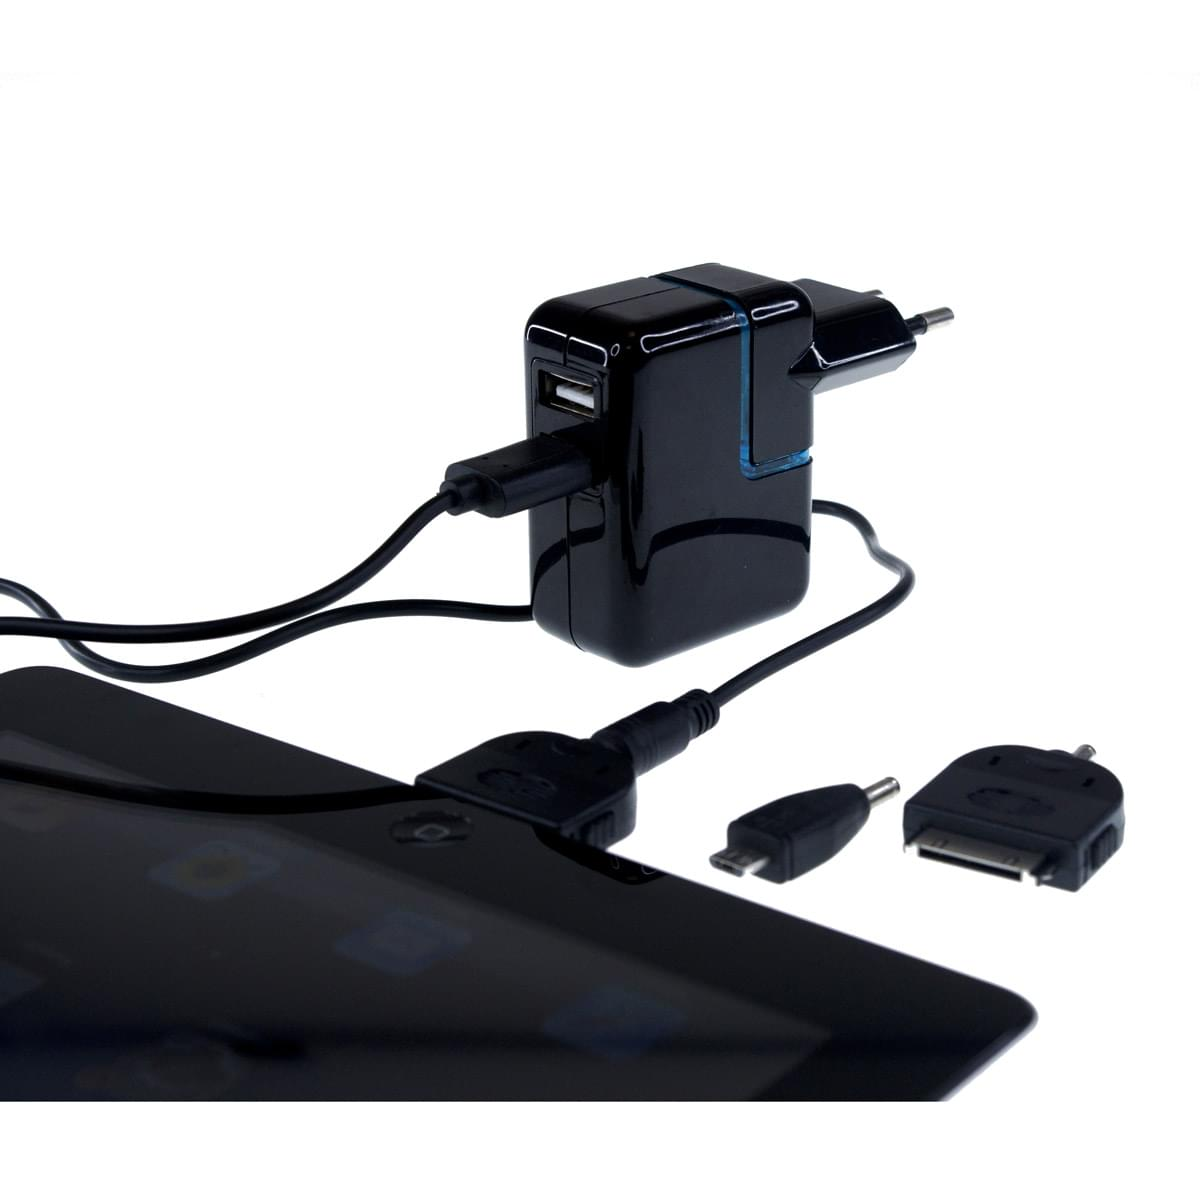 chargeur univ pour tablette samsung apple connec. Black Bedroom Furniture Sets. Home Design Ideas